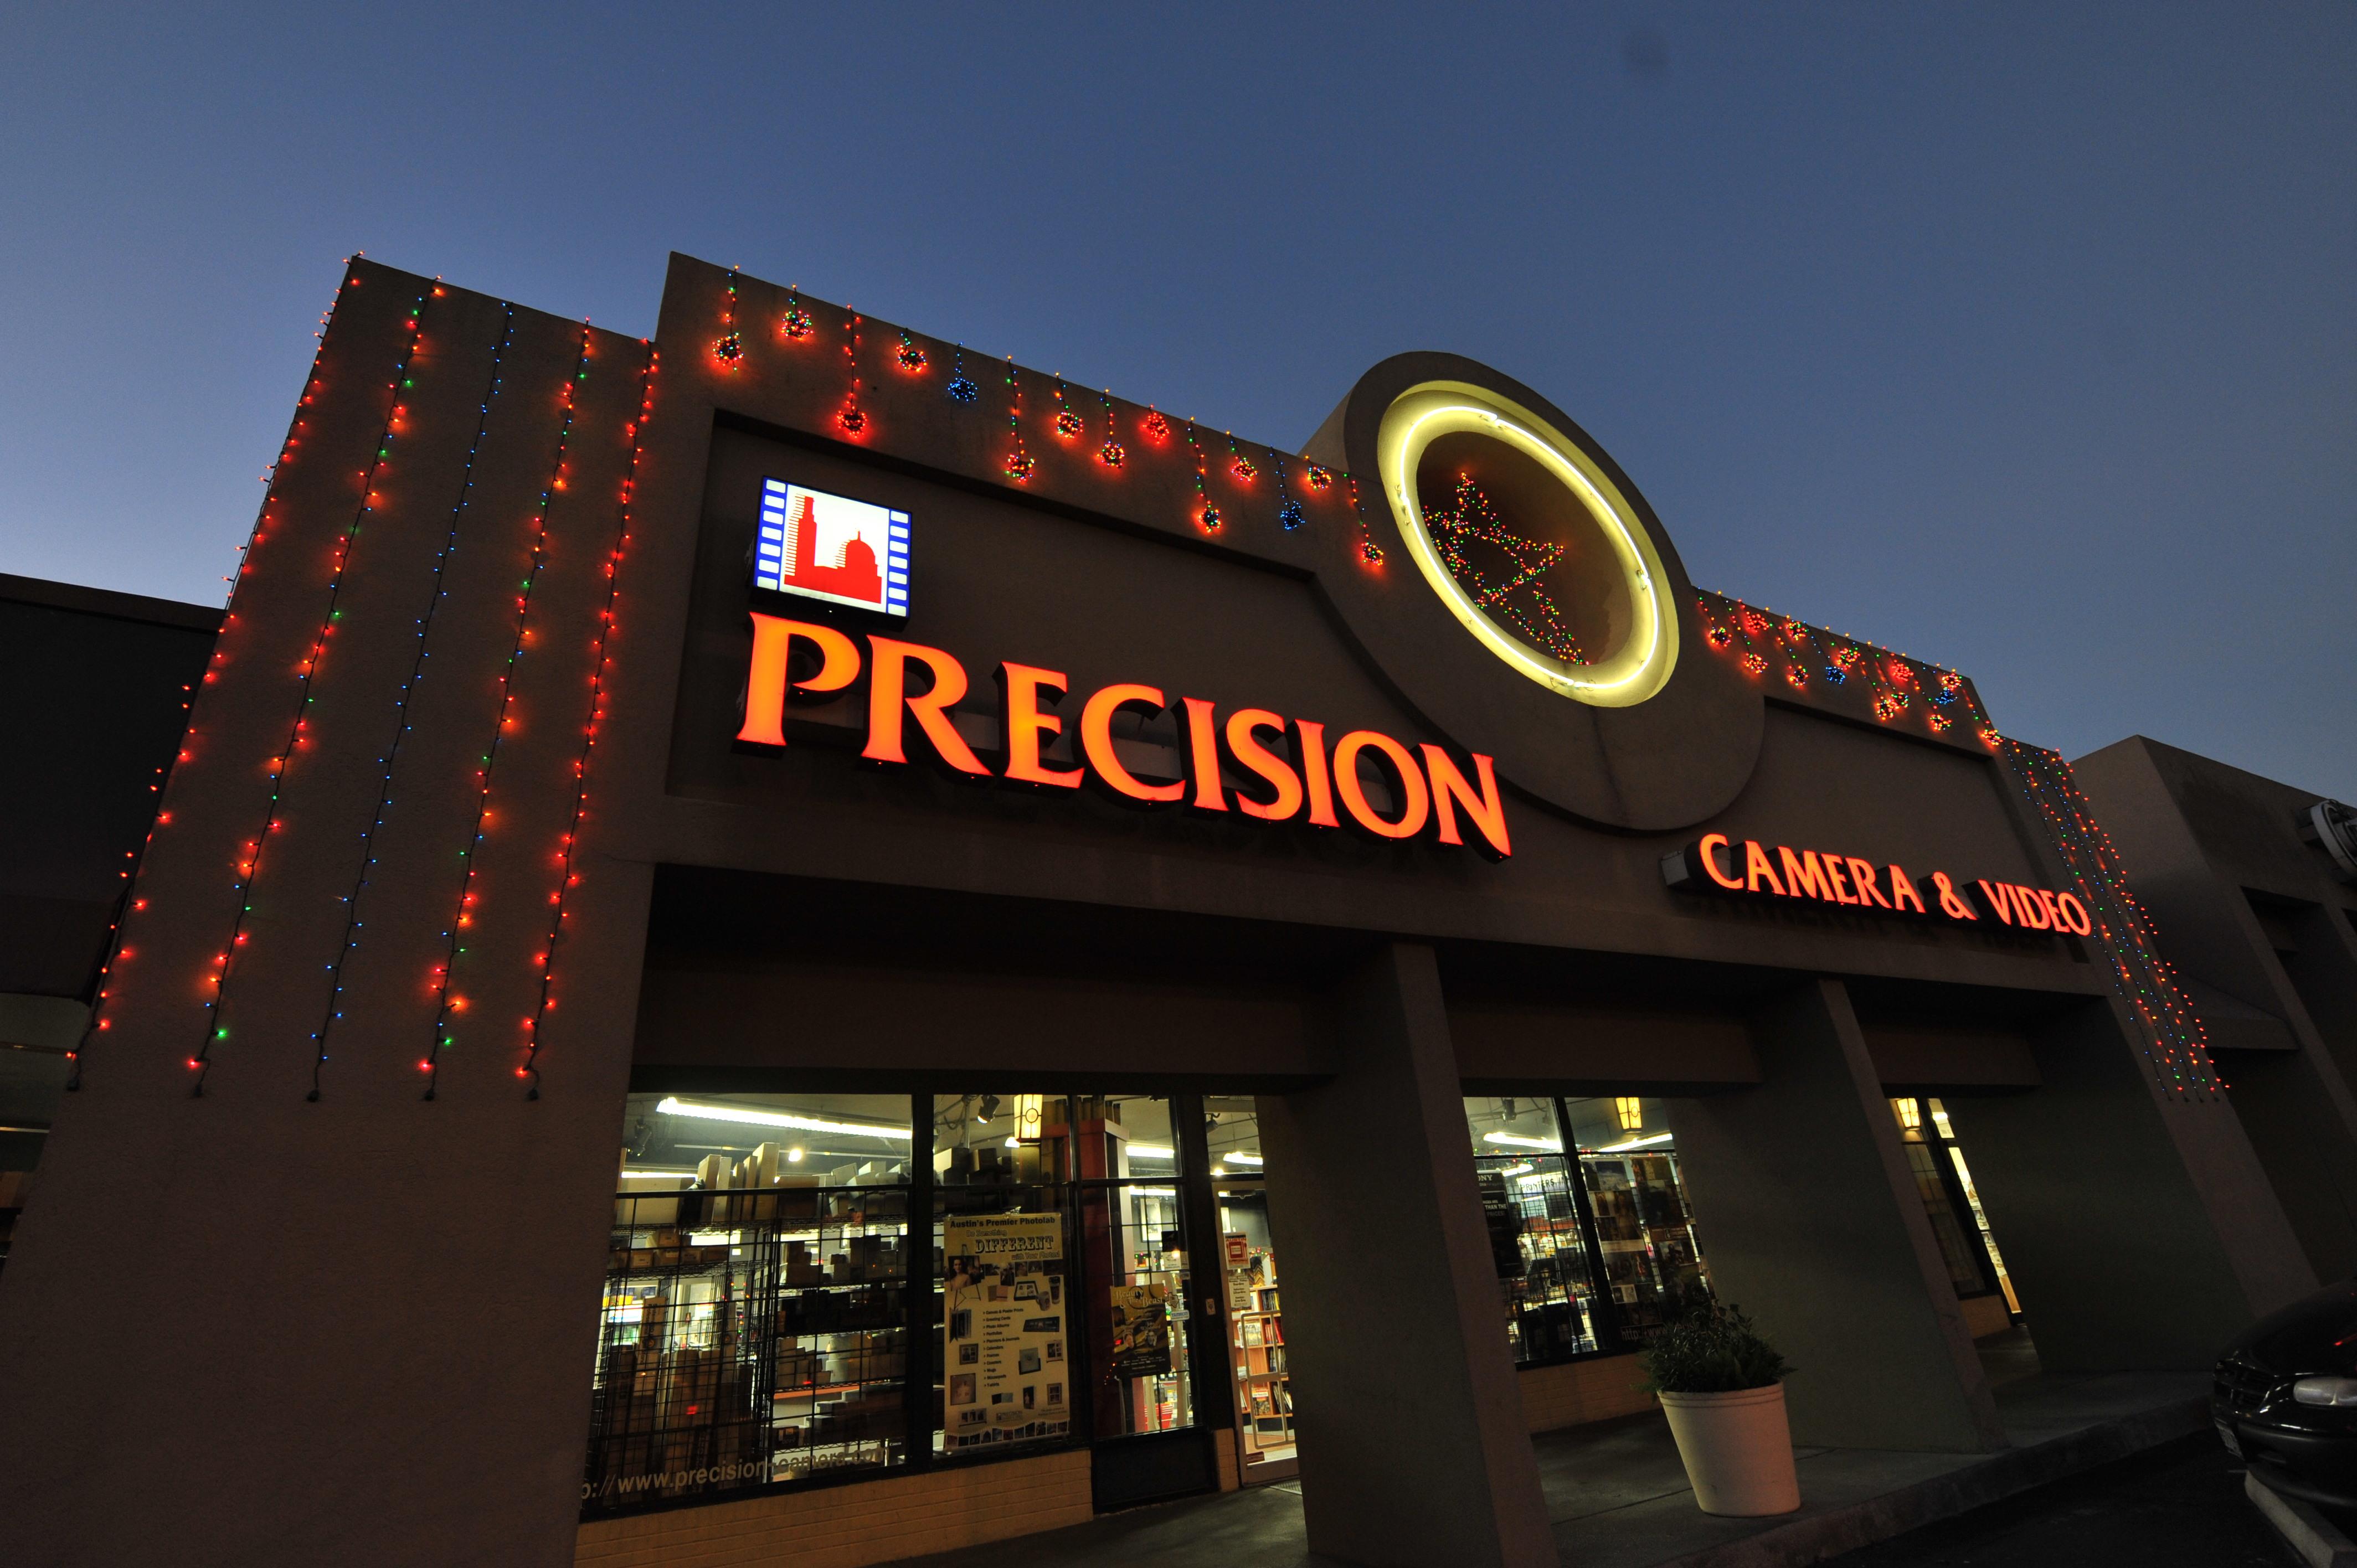 Precision Camera & Video remembers its roots at Lamar Village ...